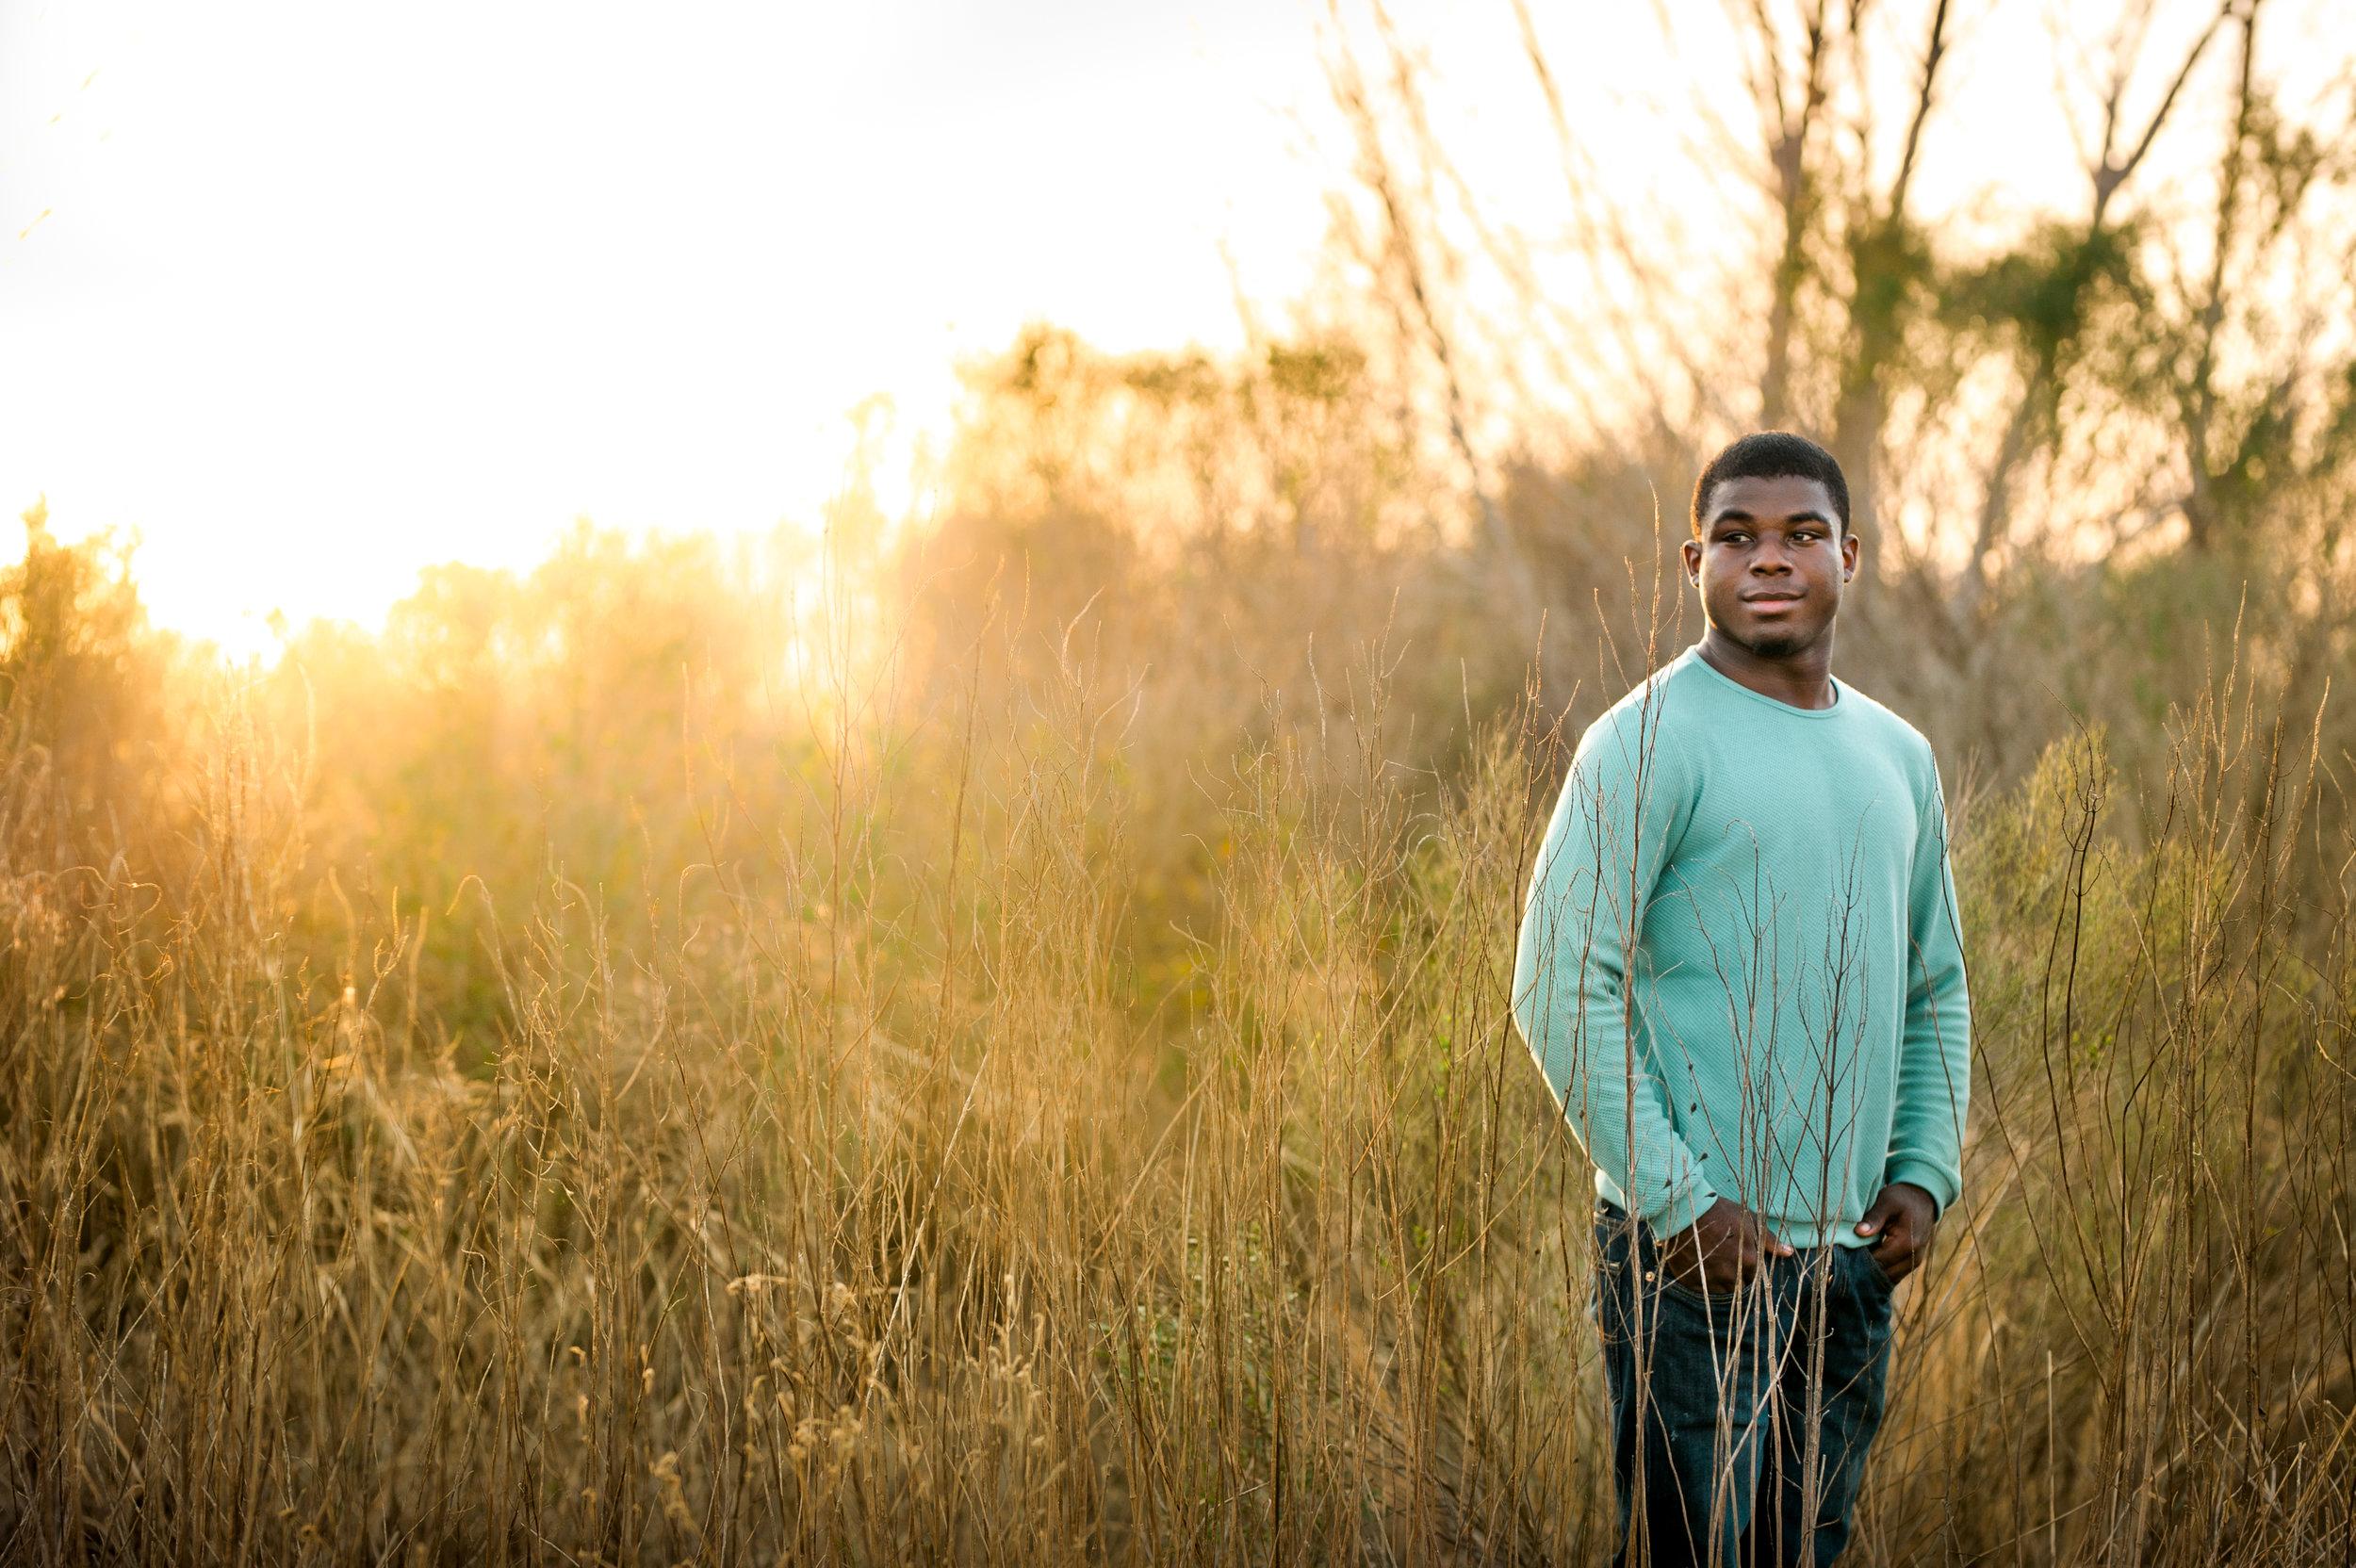 houston-tx-senior-portrait-photographer-Katy-tx-high-school-senior-photographer-sugarland-cypress-fulshear-richmond-senior-photography-21